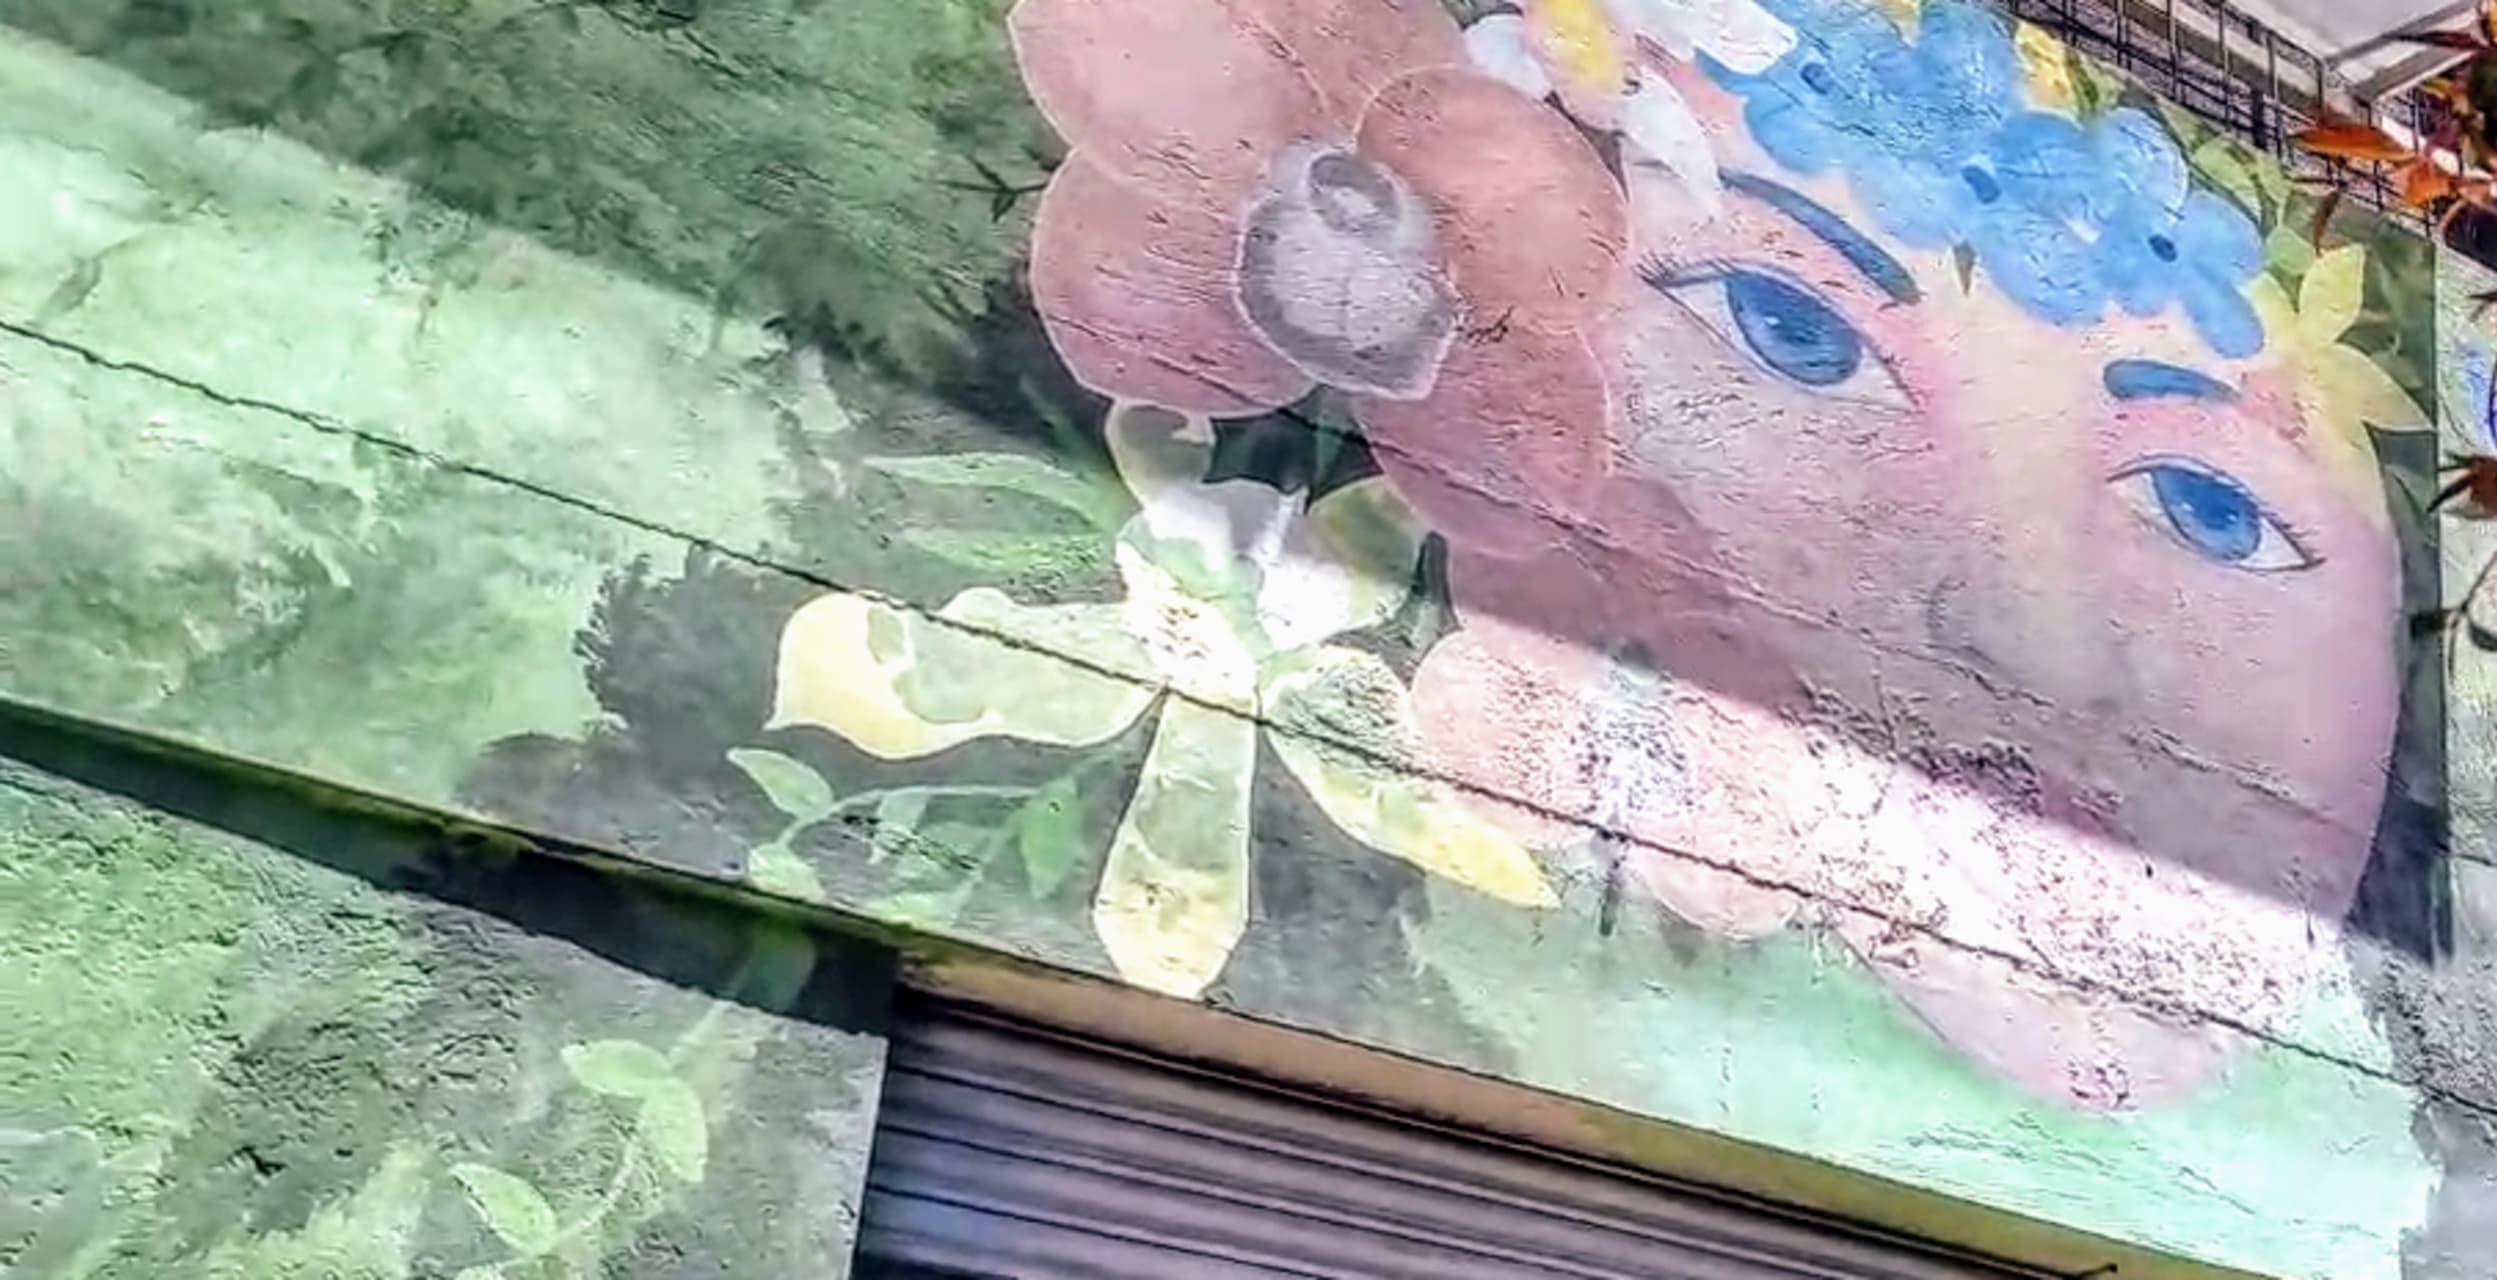 Quito - Famous Quito neighborhood Murals & Orchids